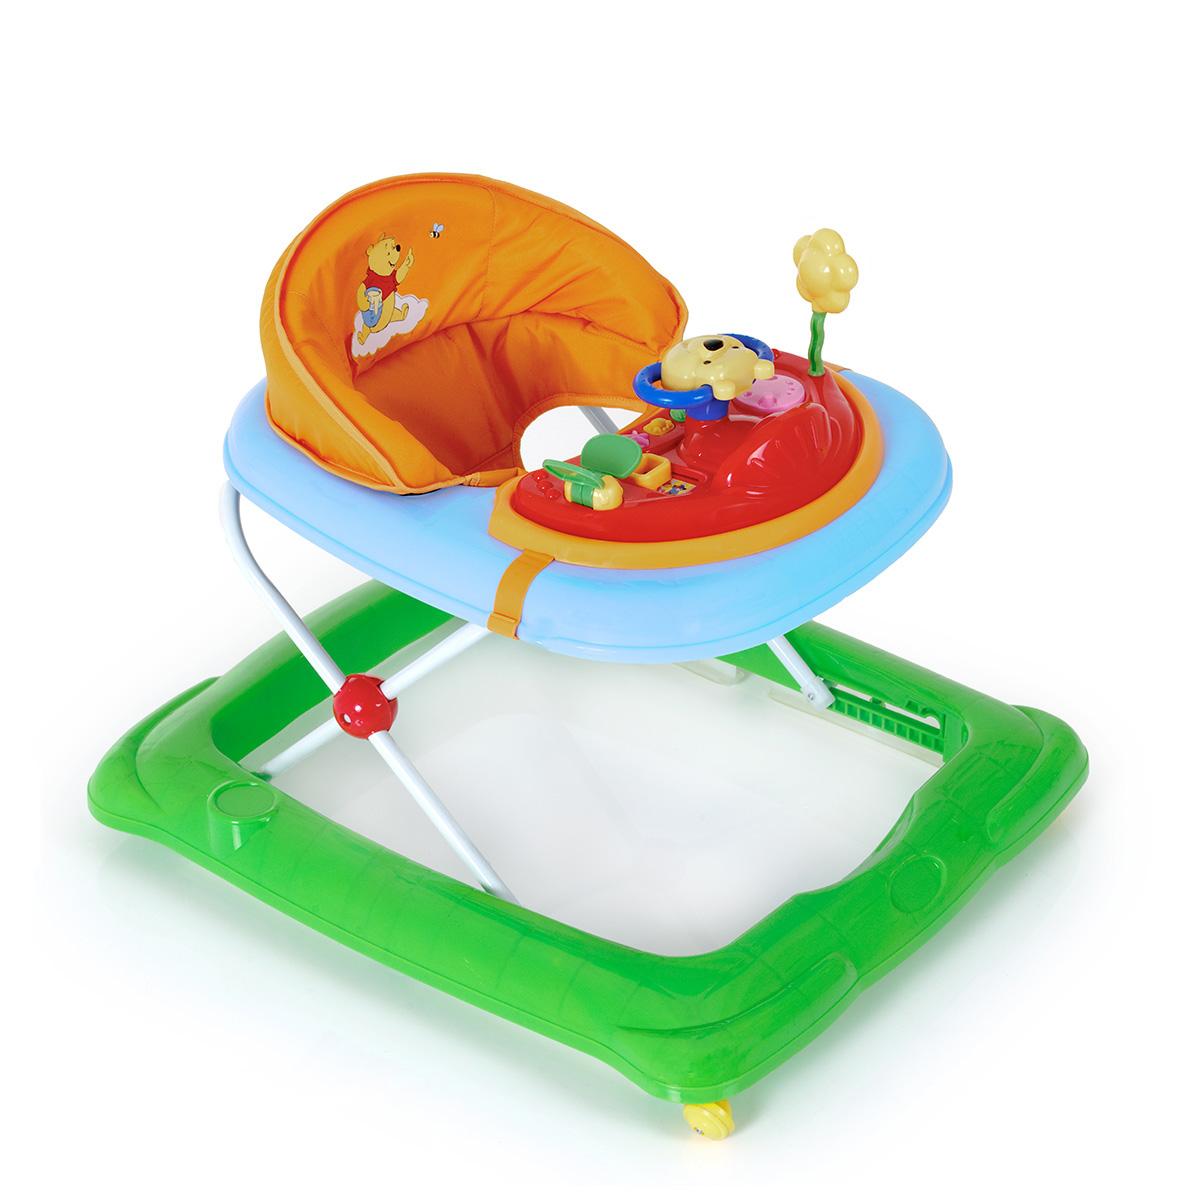 33-642177.main.Player_Pooh